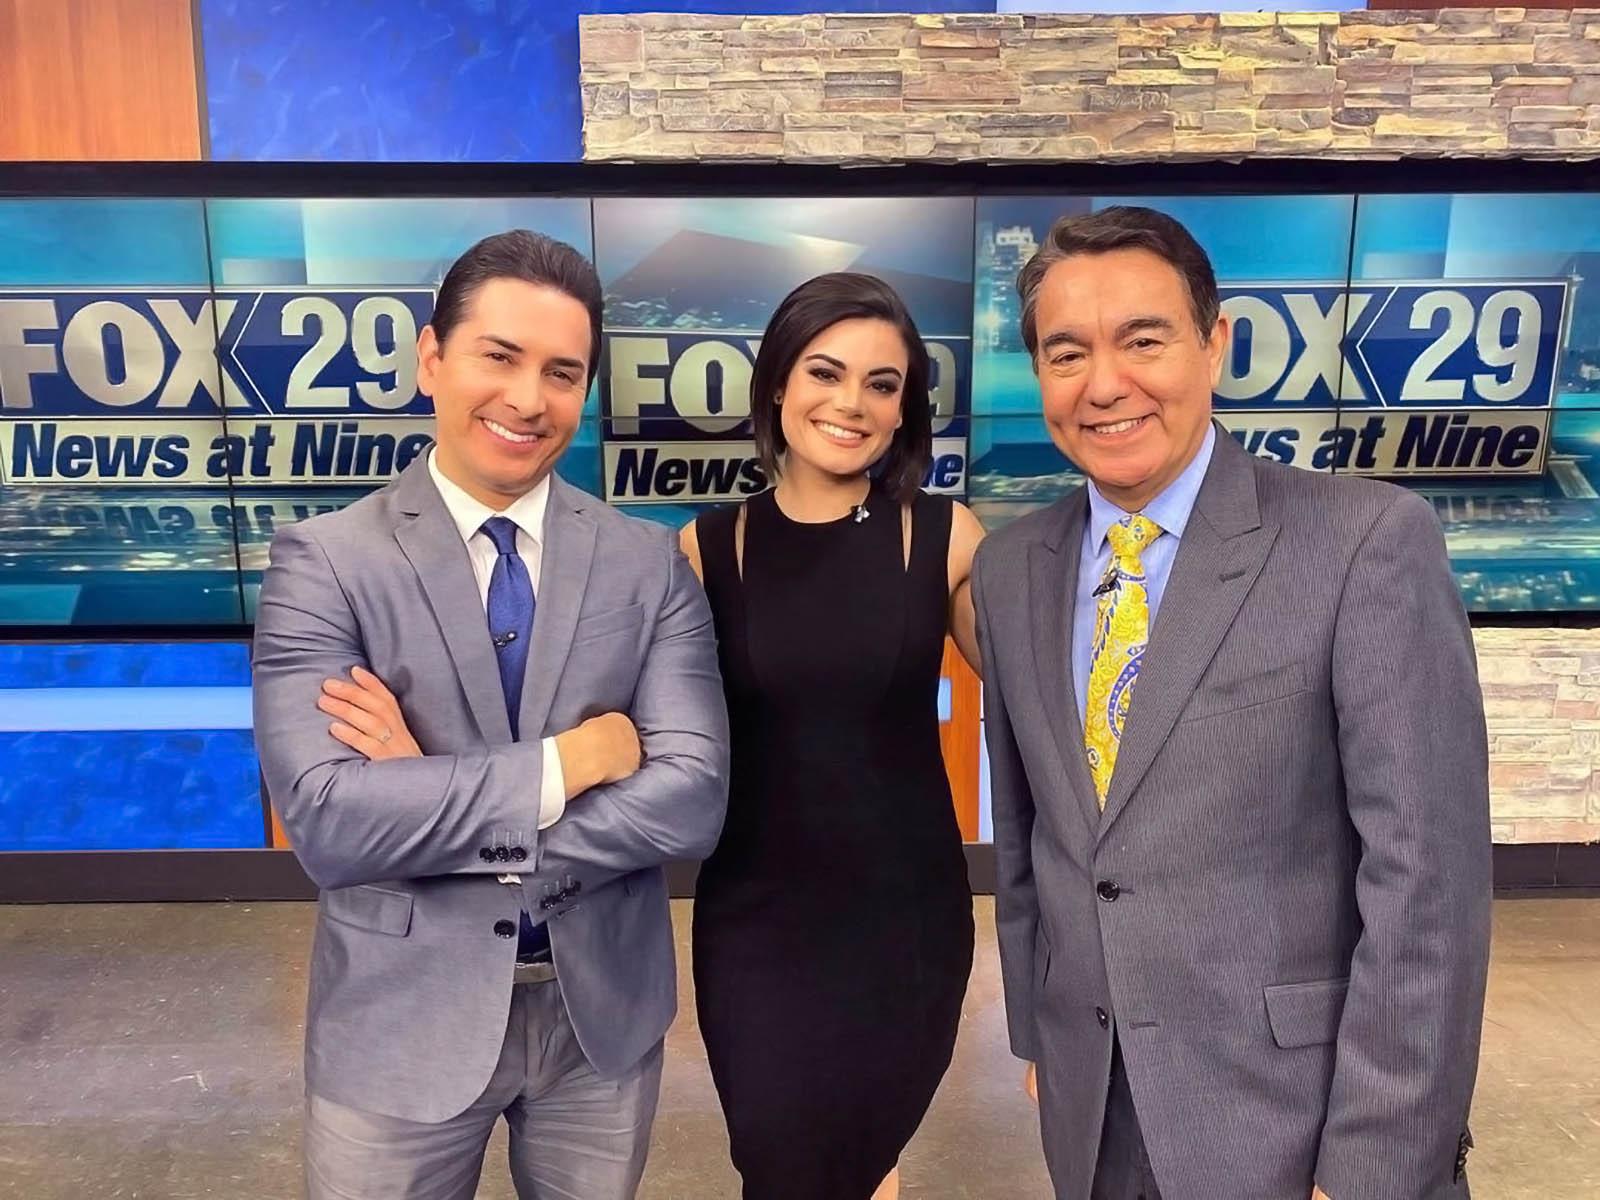 Ryan Wolf, Camilla Rambaldi, and Alex Garcia at Studio of Fox 29 San Antonio